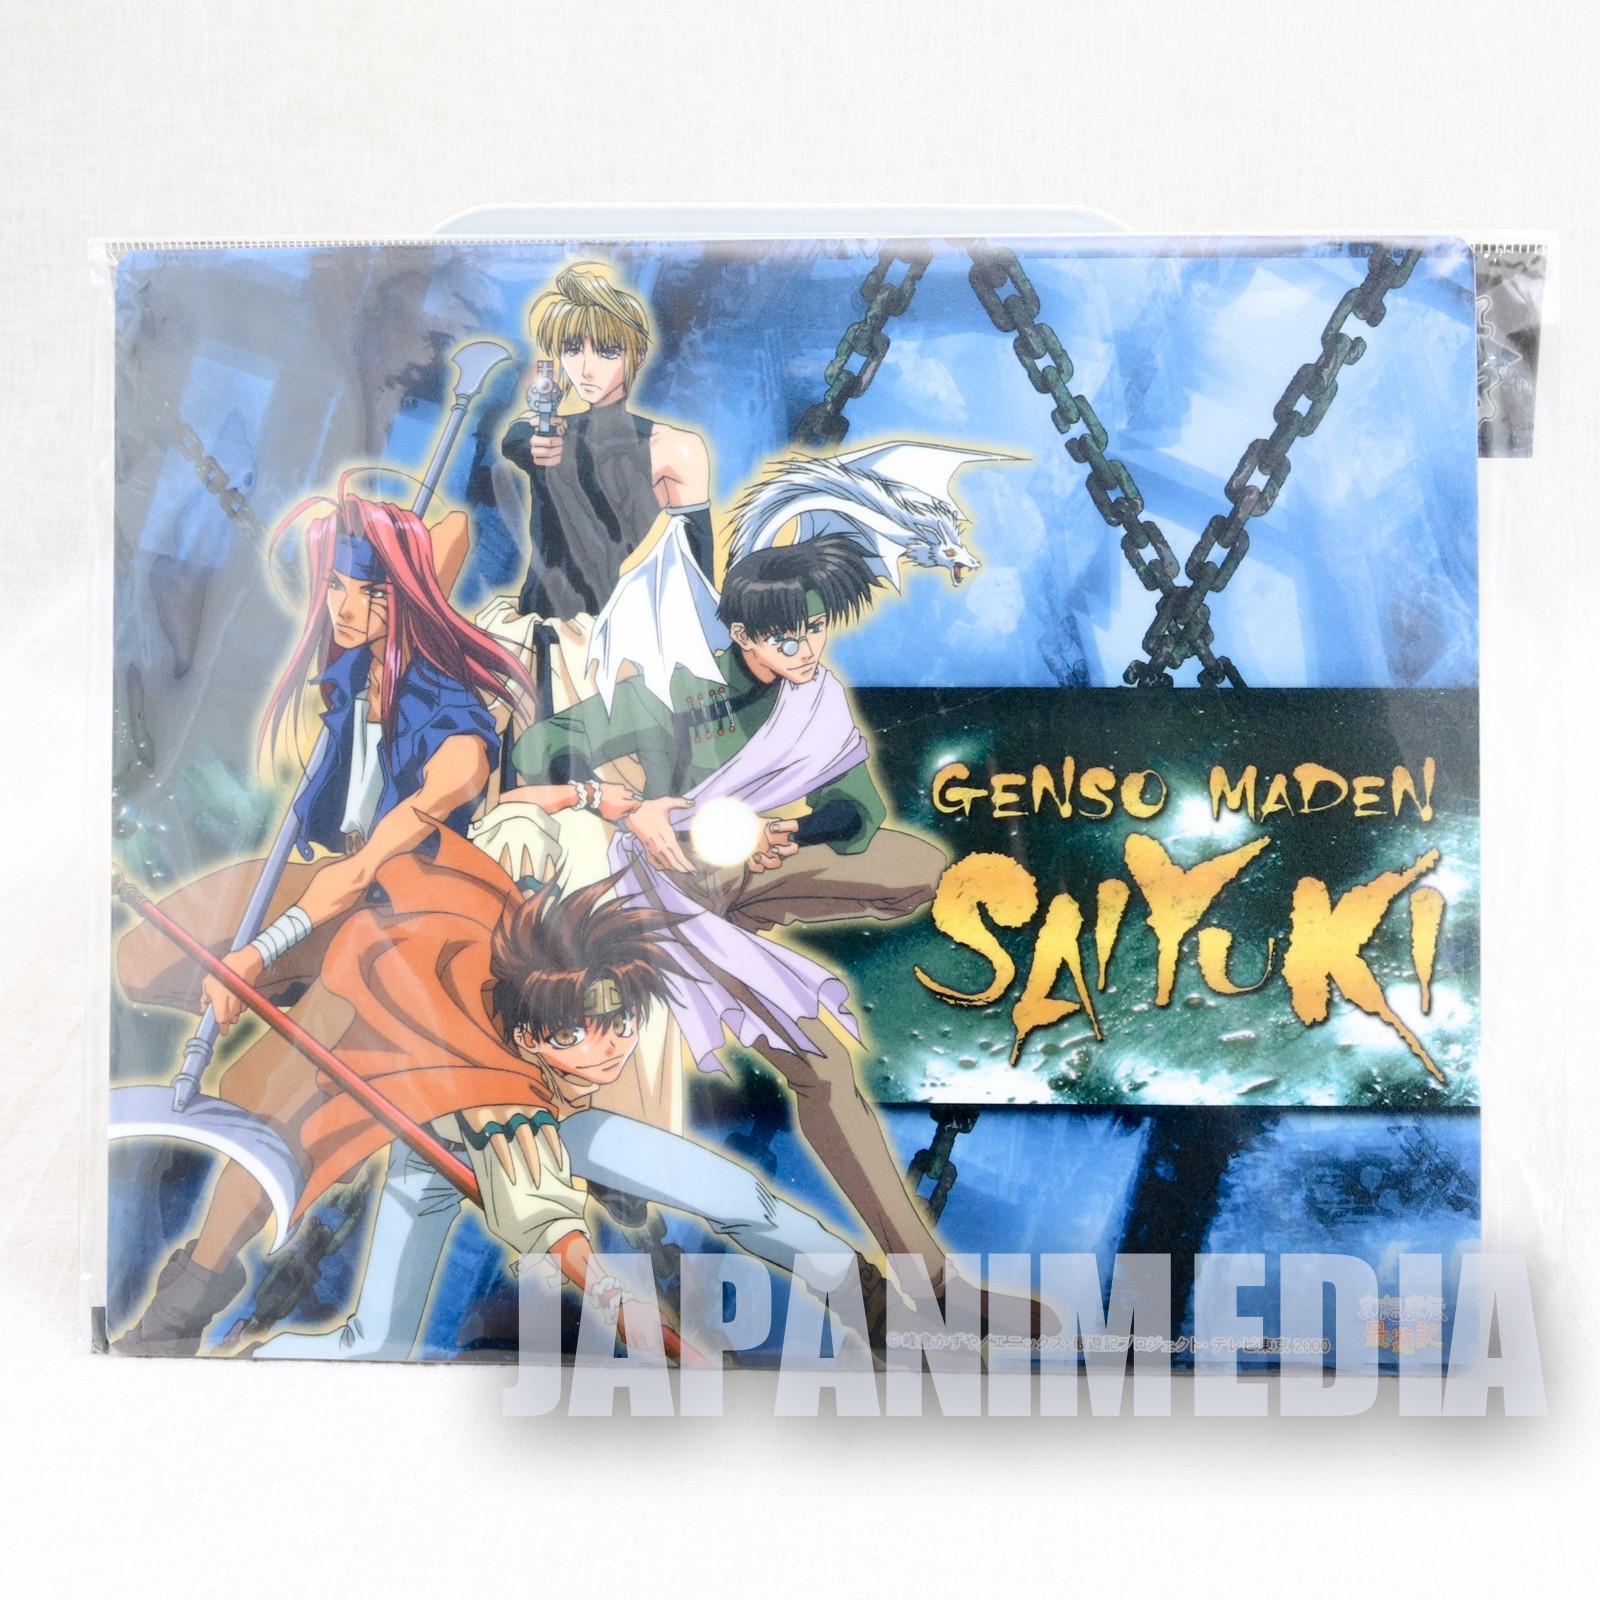 Gensomaden SAIYUKI Mouse pad [Sanzo / Goku / Gojyo / Hakkai] JAPAN ANIME #1